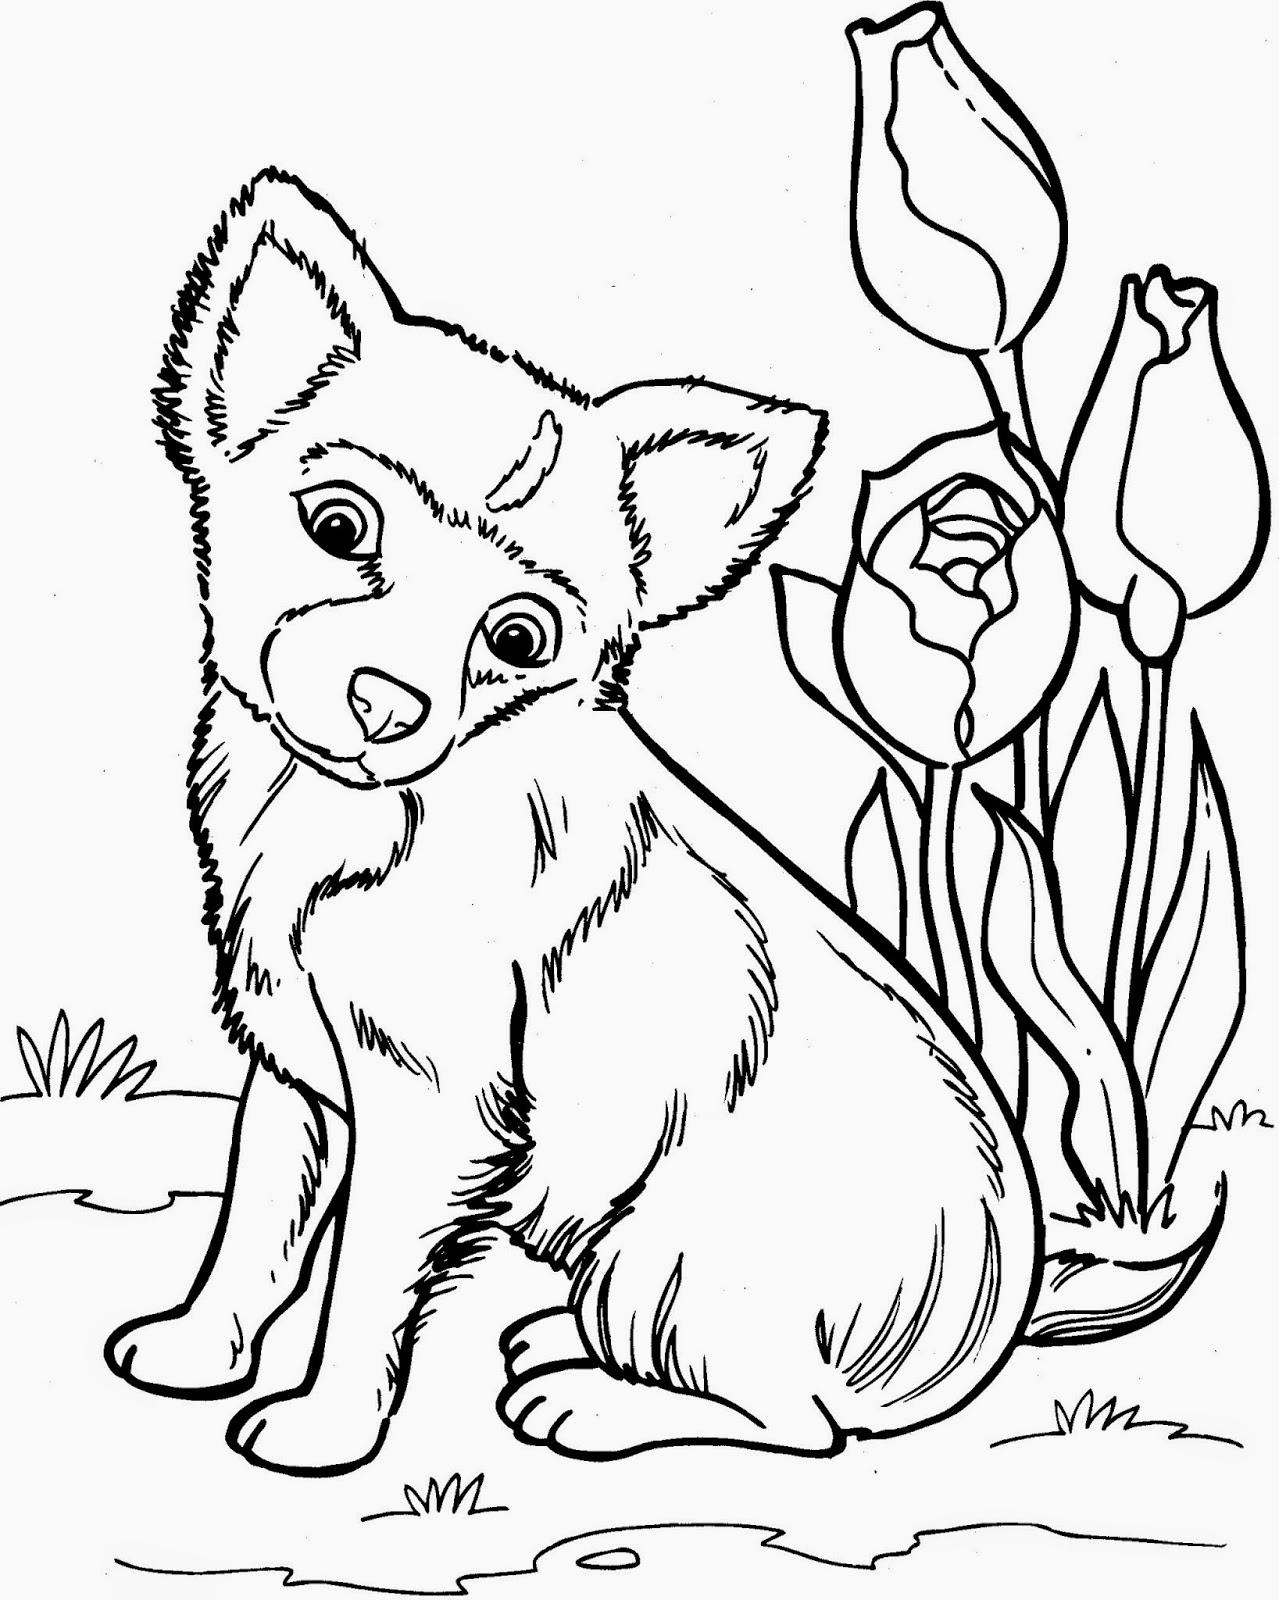 kleurplaat hondekop ausmalbilder zum ausdrucken